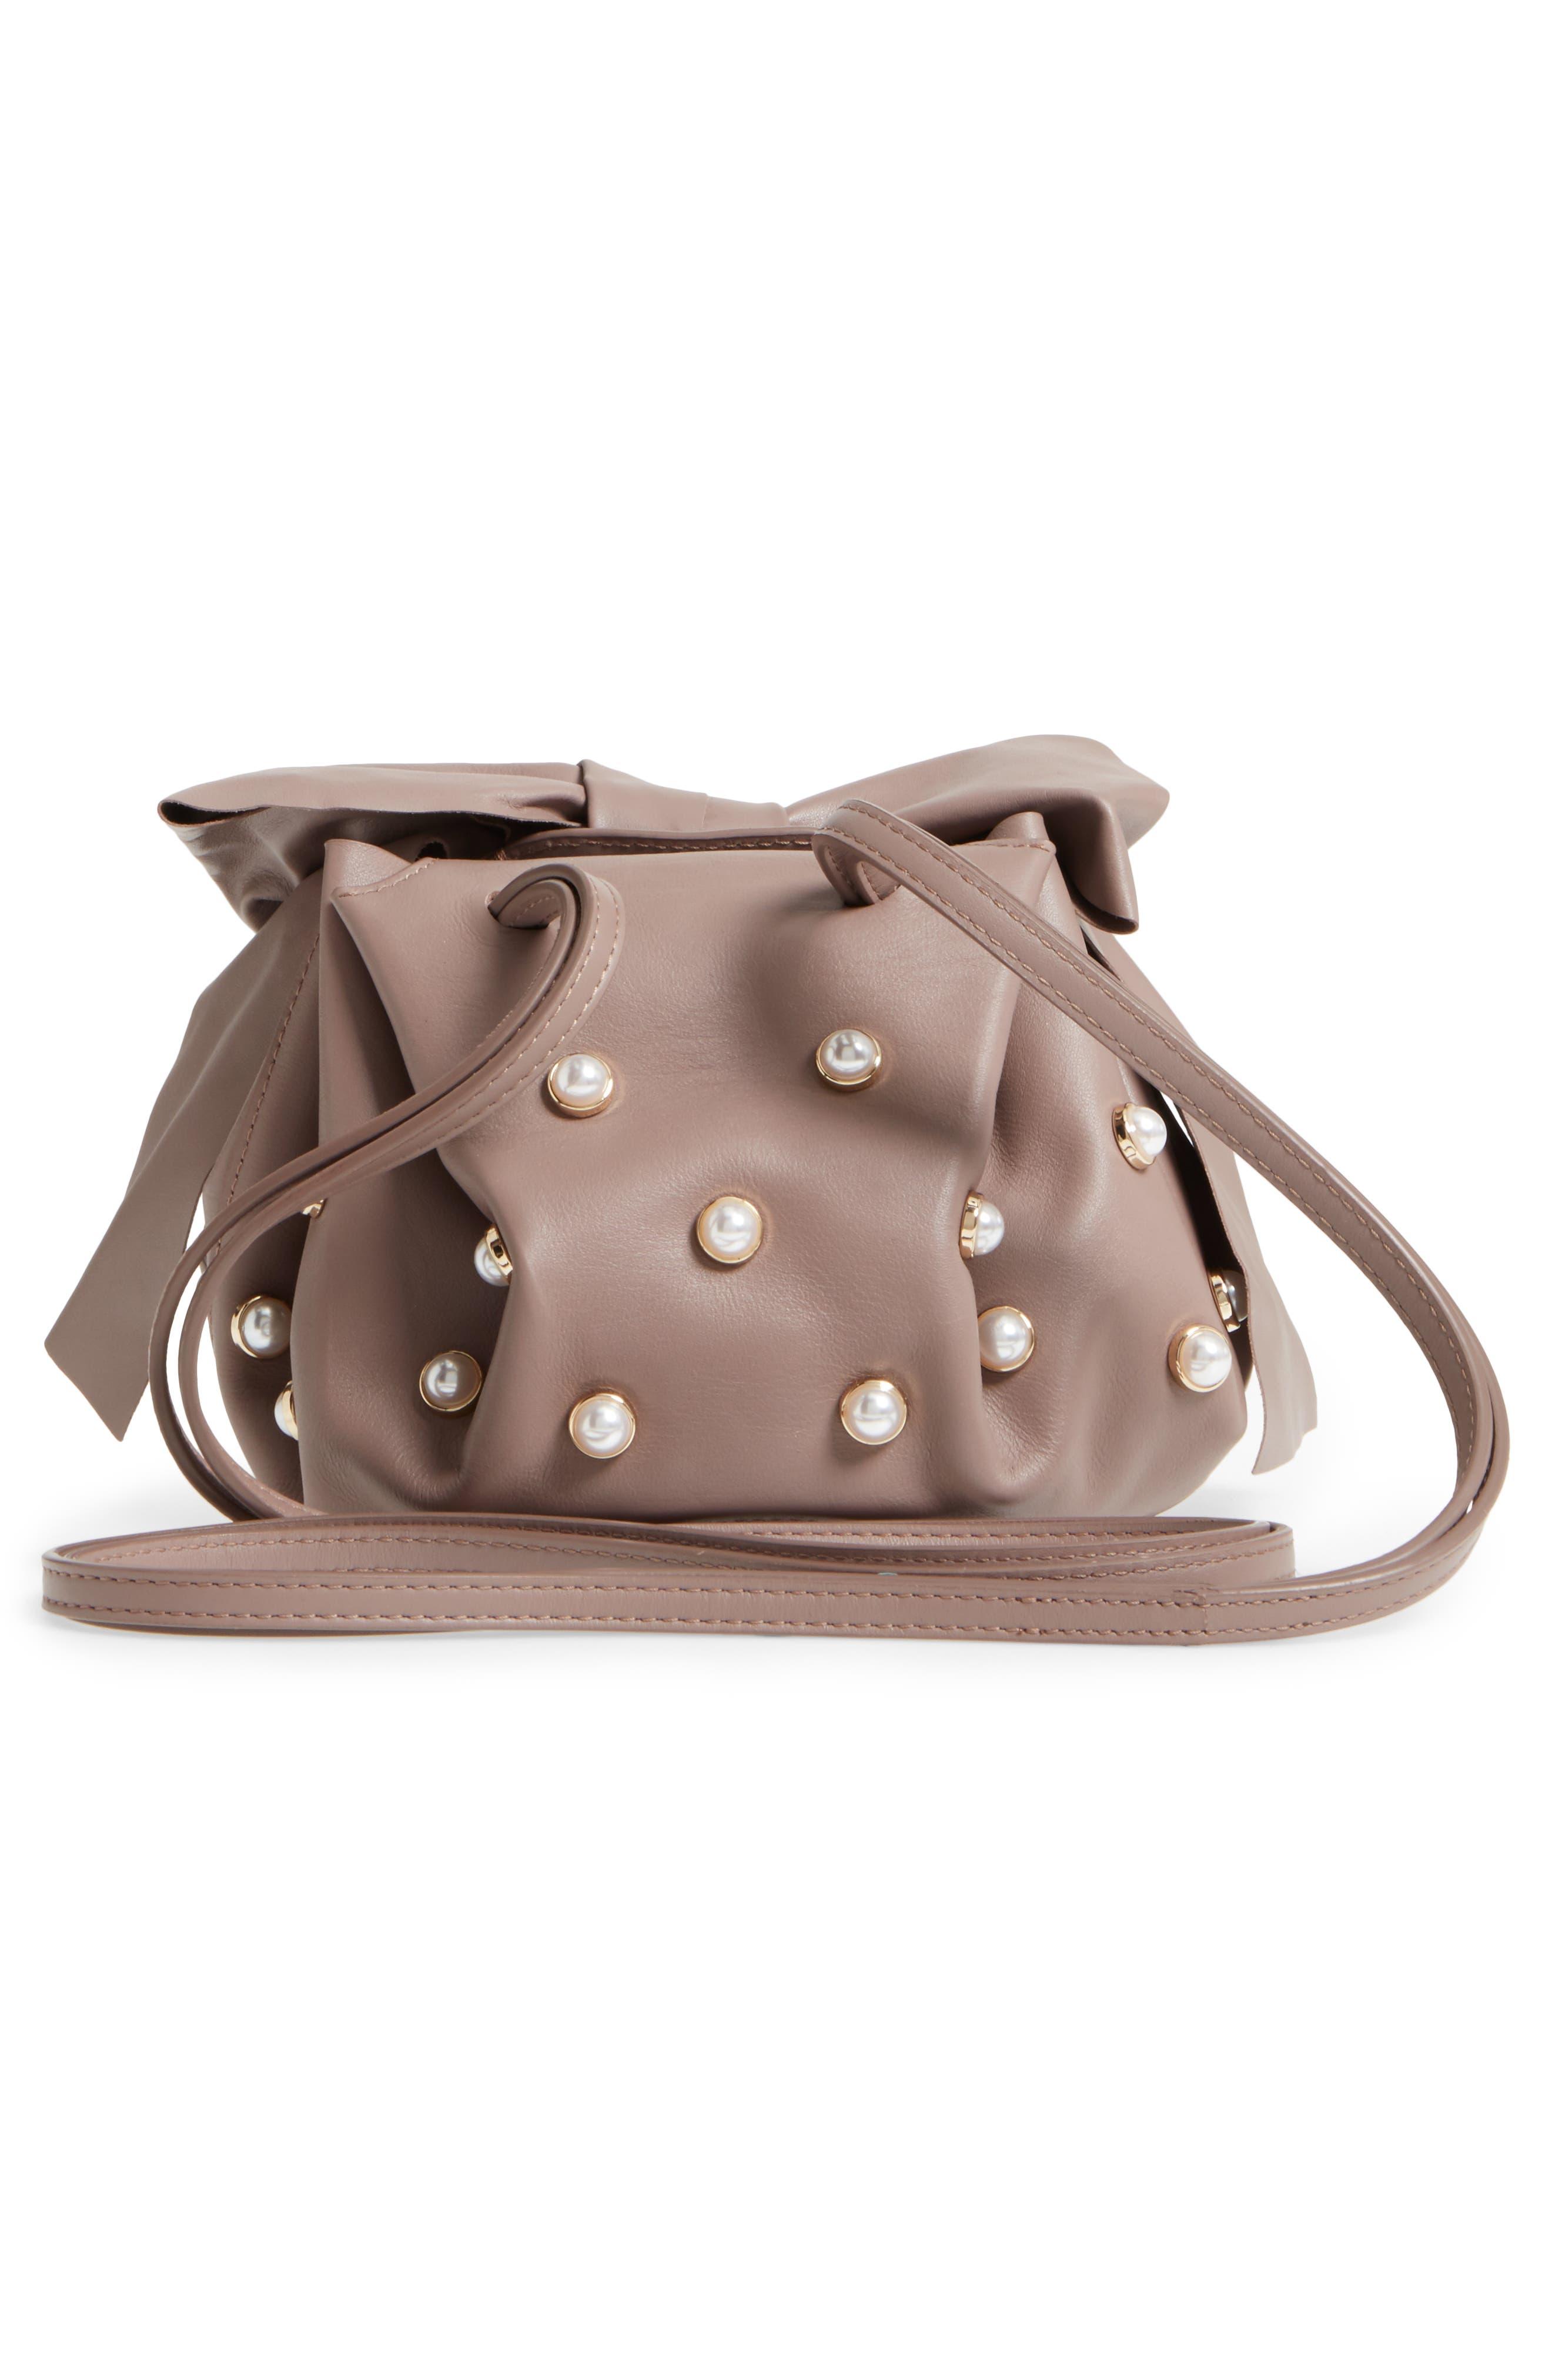 Soirée Imitation Pearl Lady Leather Crossbody Bag,                             Alternate thumbnail 3, color,                             530